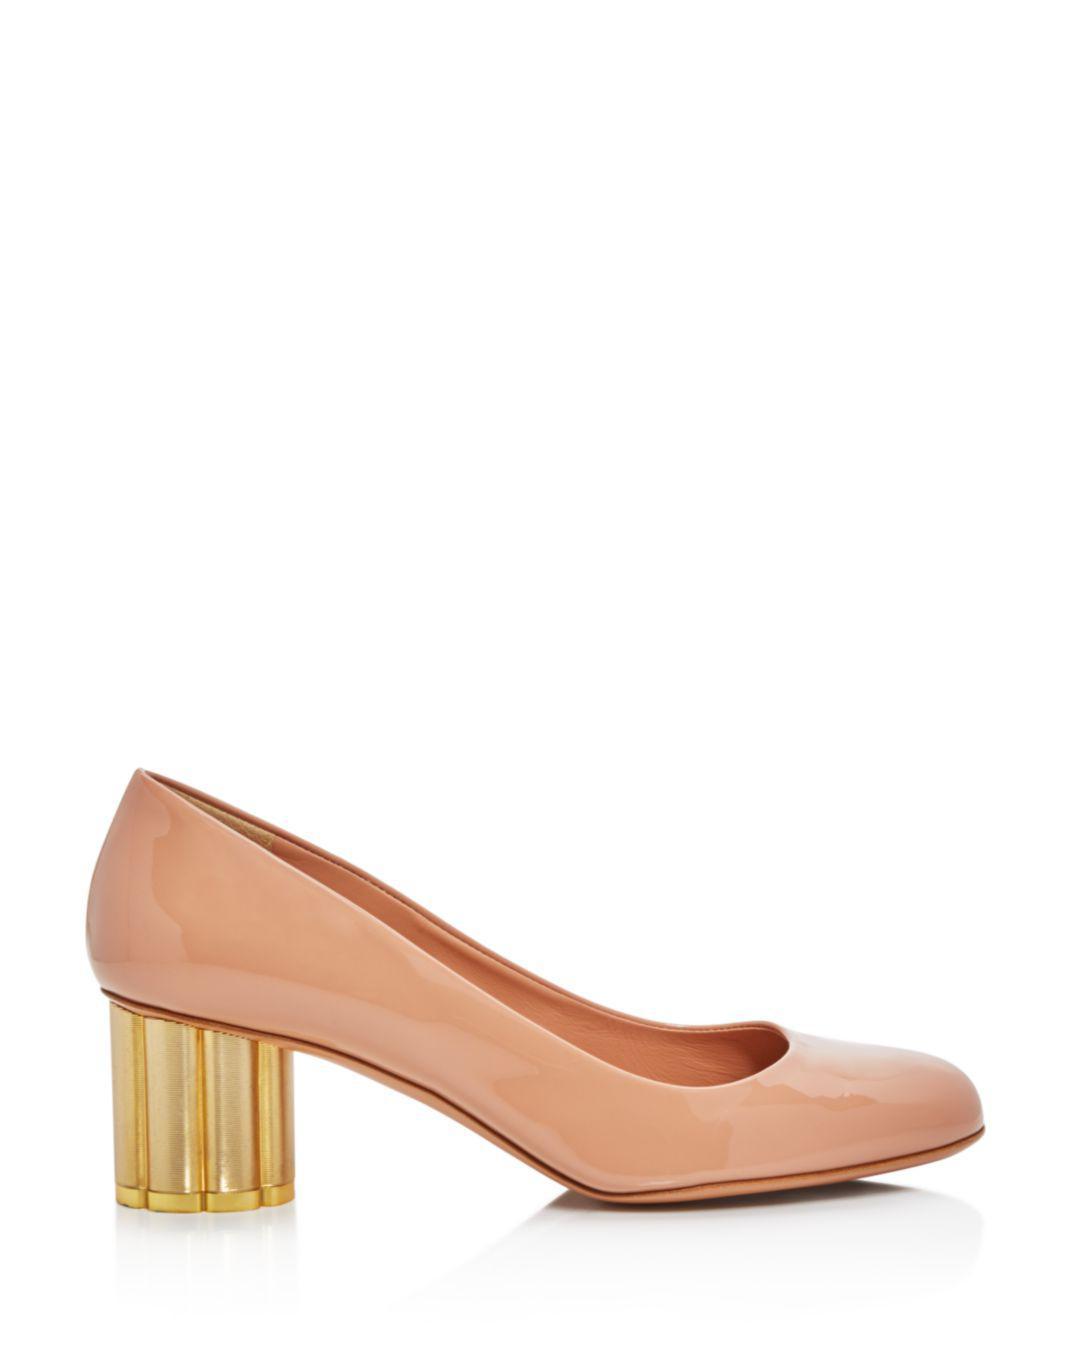 30c82b5006c2 Lyst - Ferragamo Lucca Flower-heel Patent-leather Pumps - Save 59%